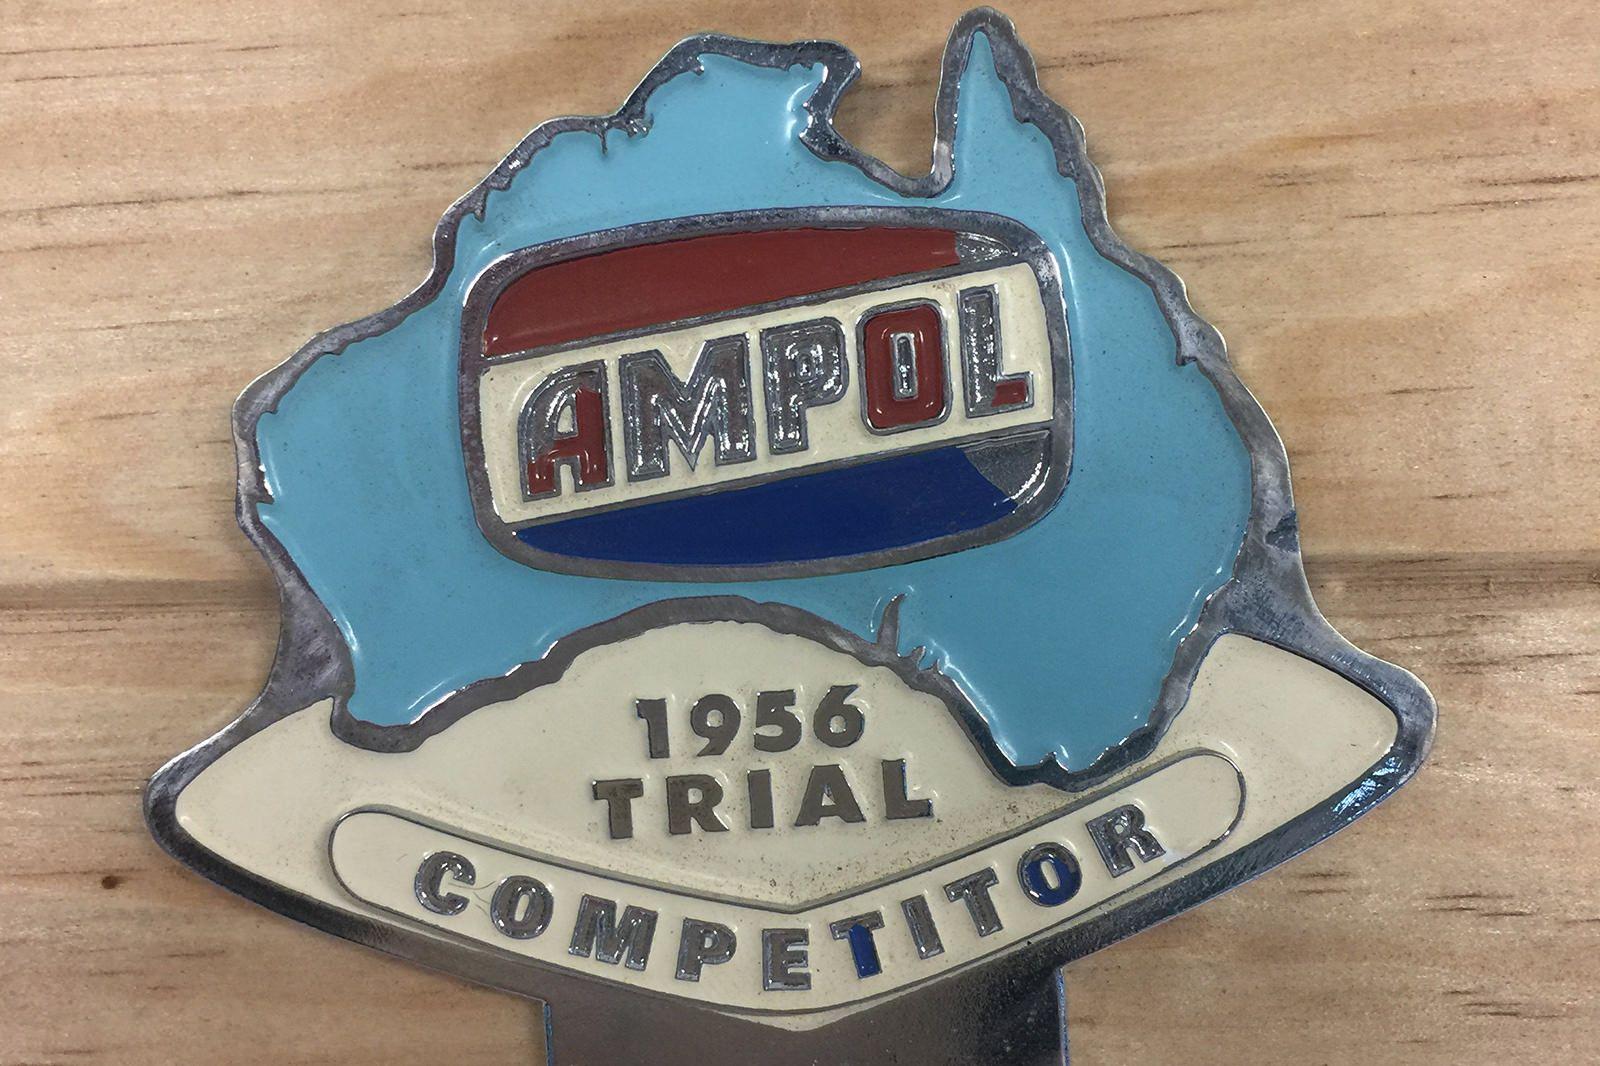 1954 - 1958 Redex Trial Grill badge Board